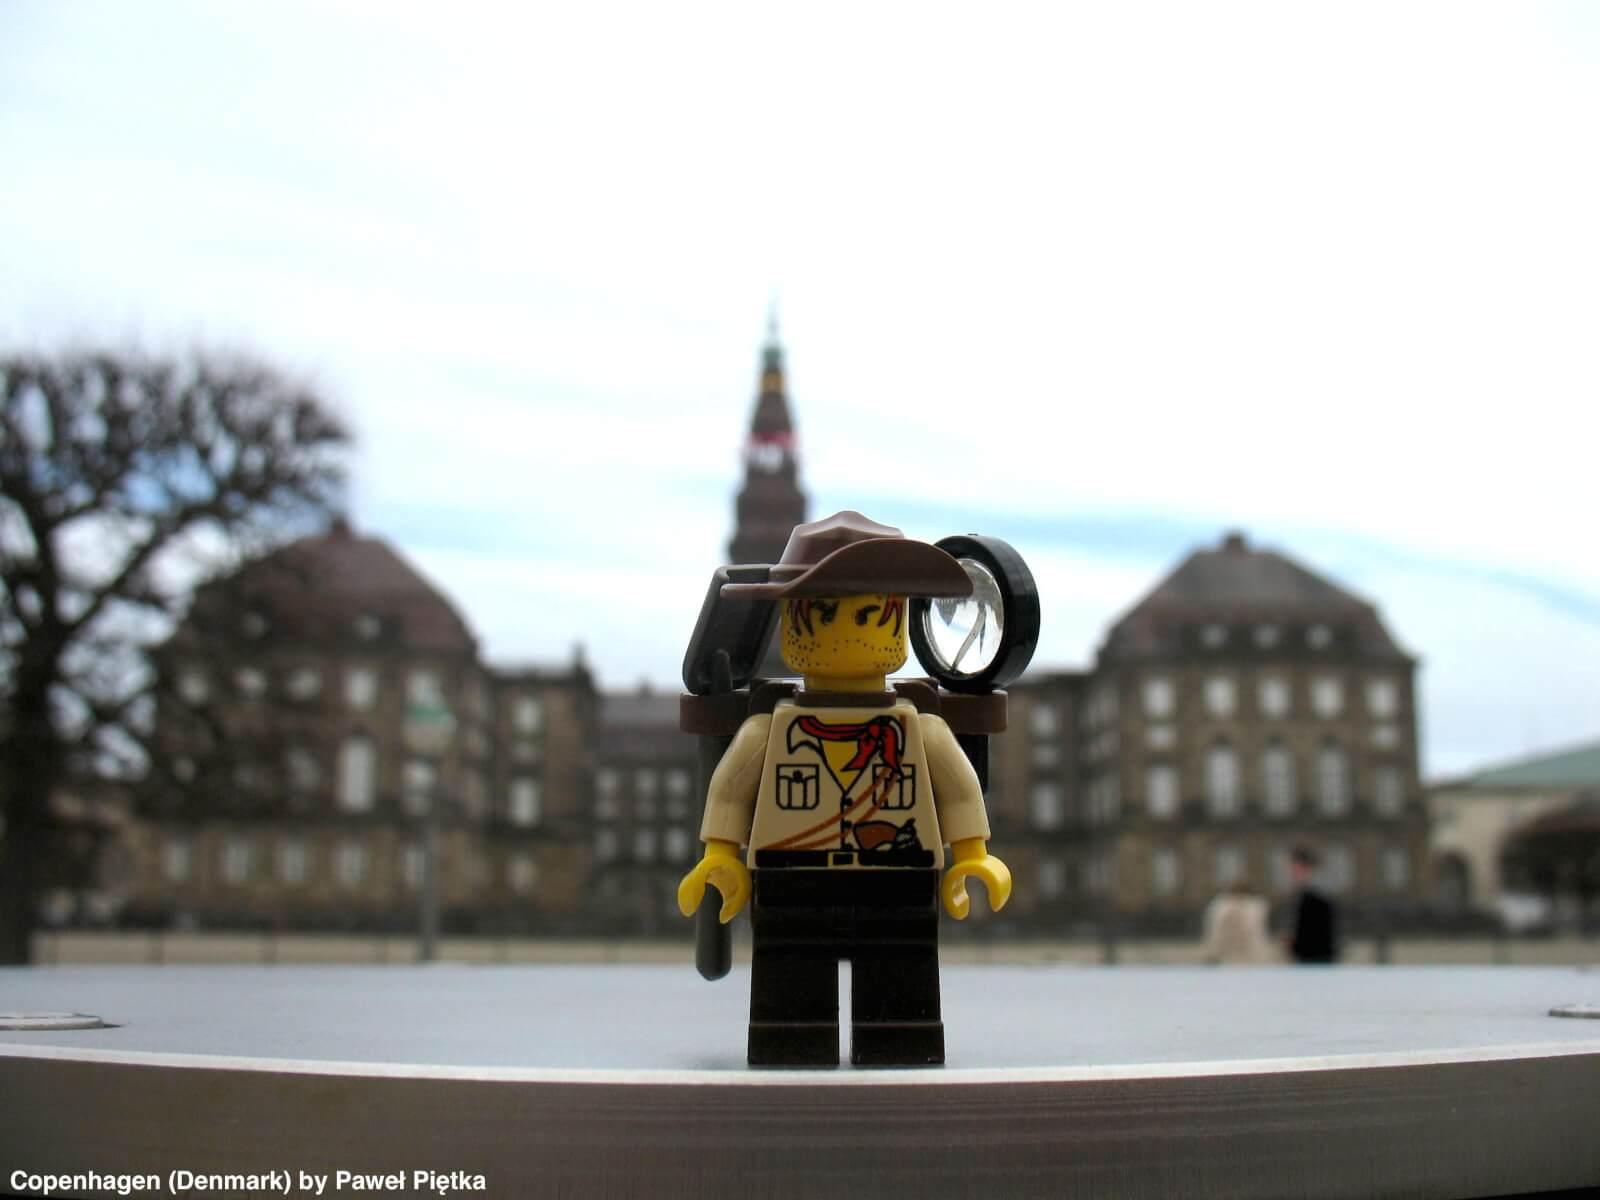 Copenhagen (Denmark) - Christiansborg Palace